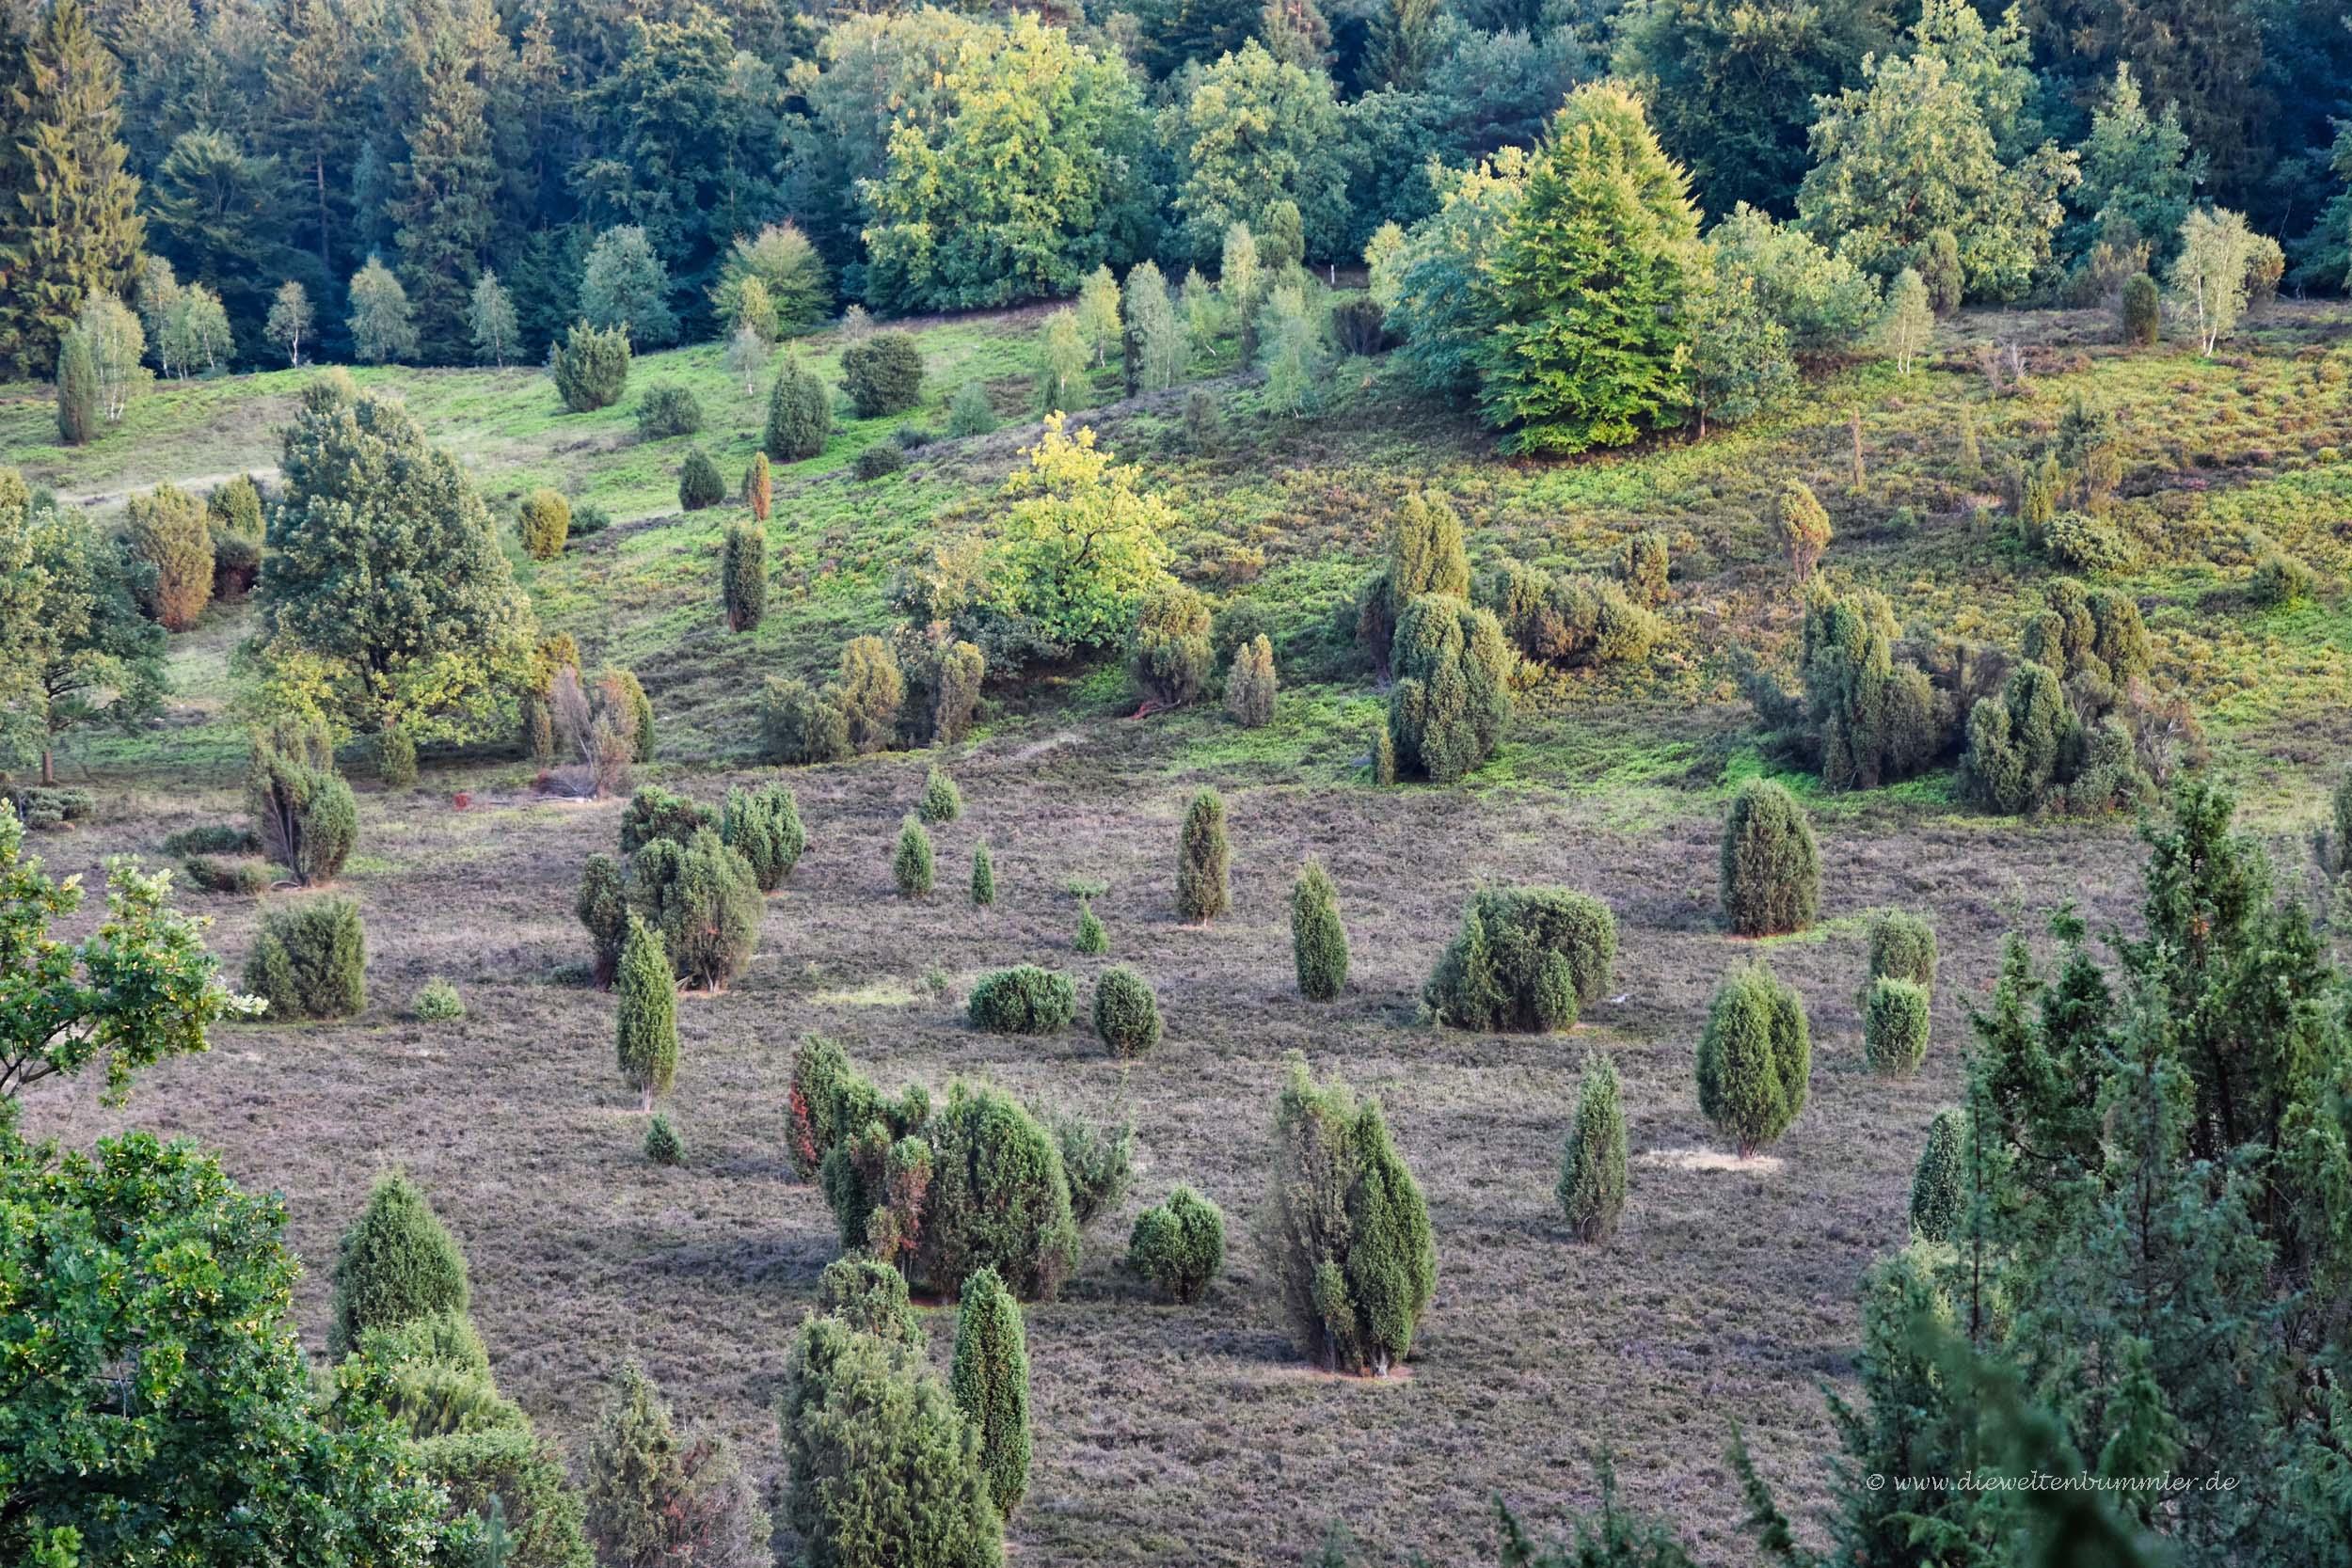 Heidefläche am Totengrund